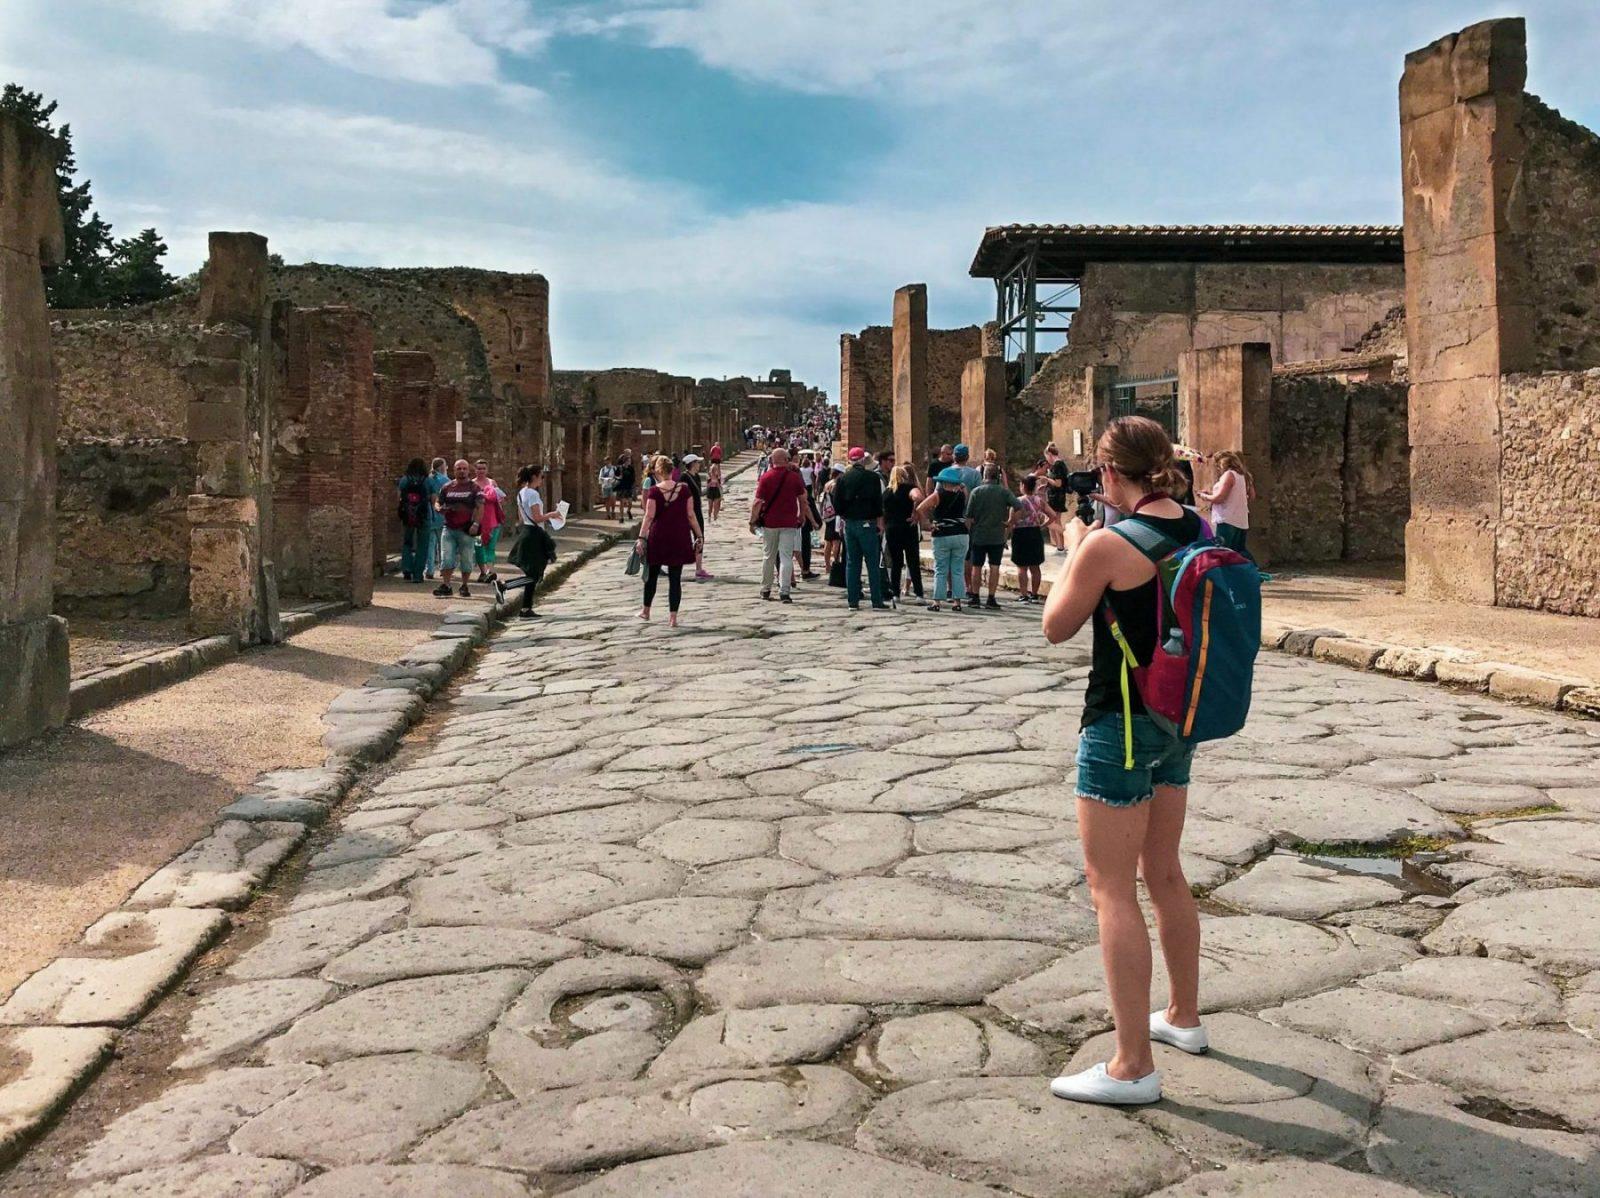 Cultural powerhouse Pompeii